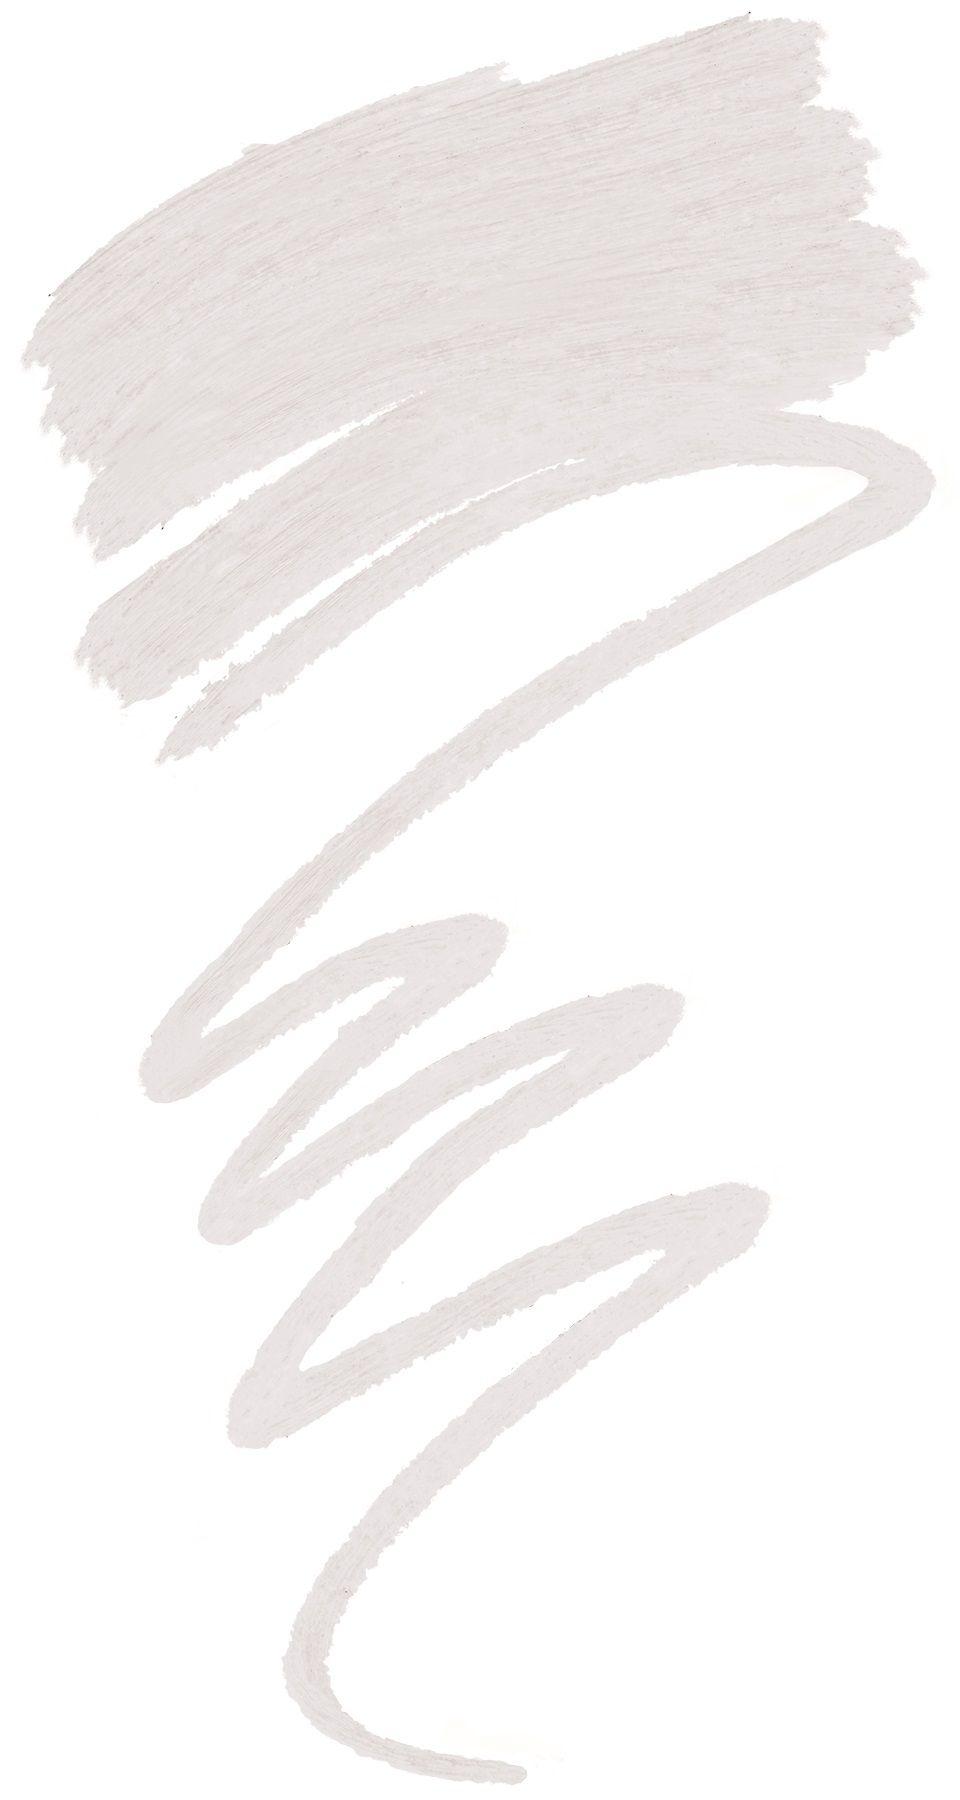 Blank - Transparent